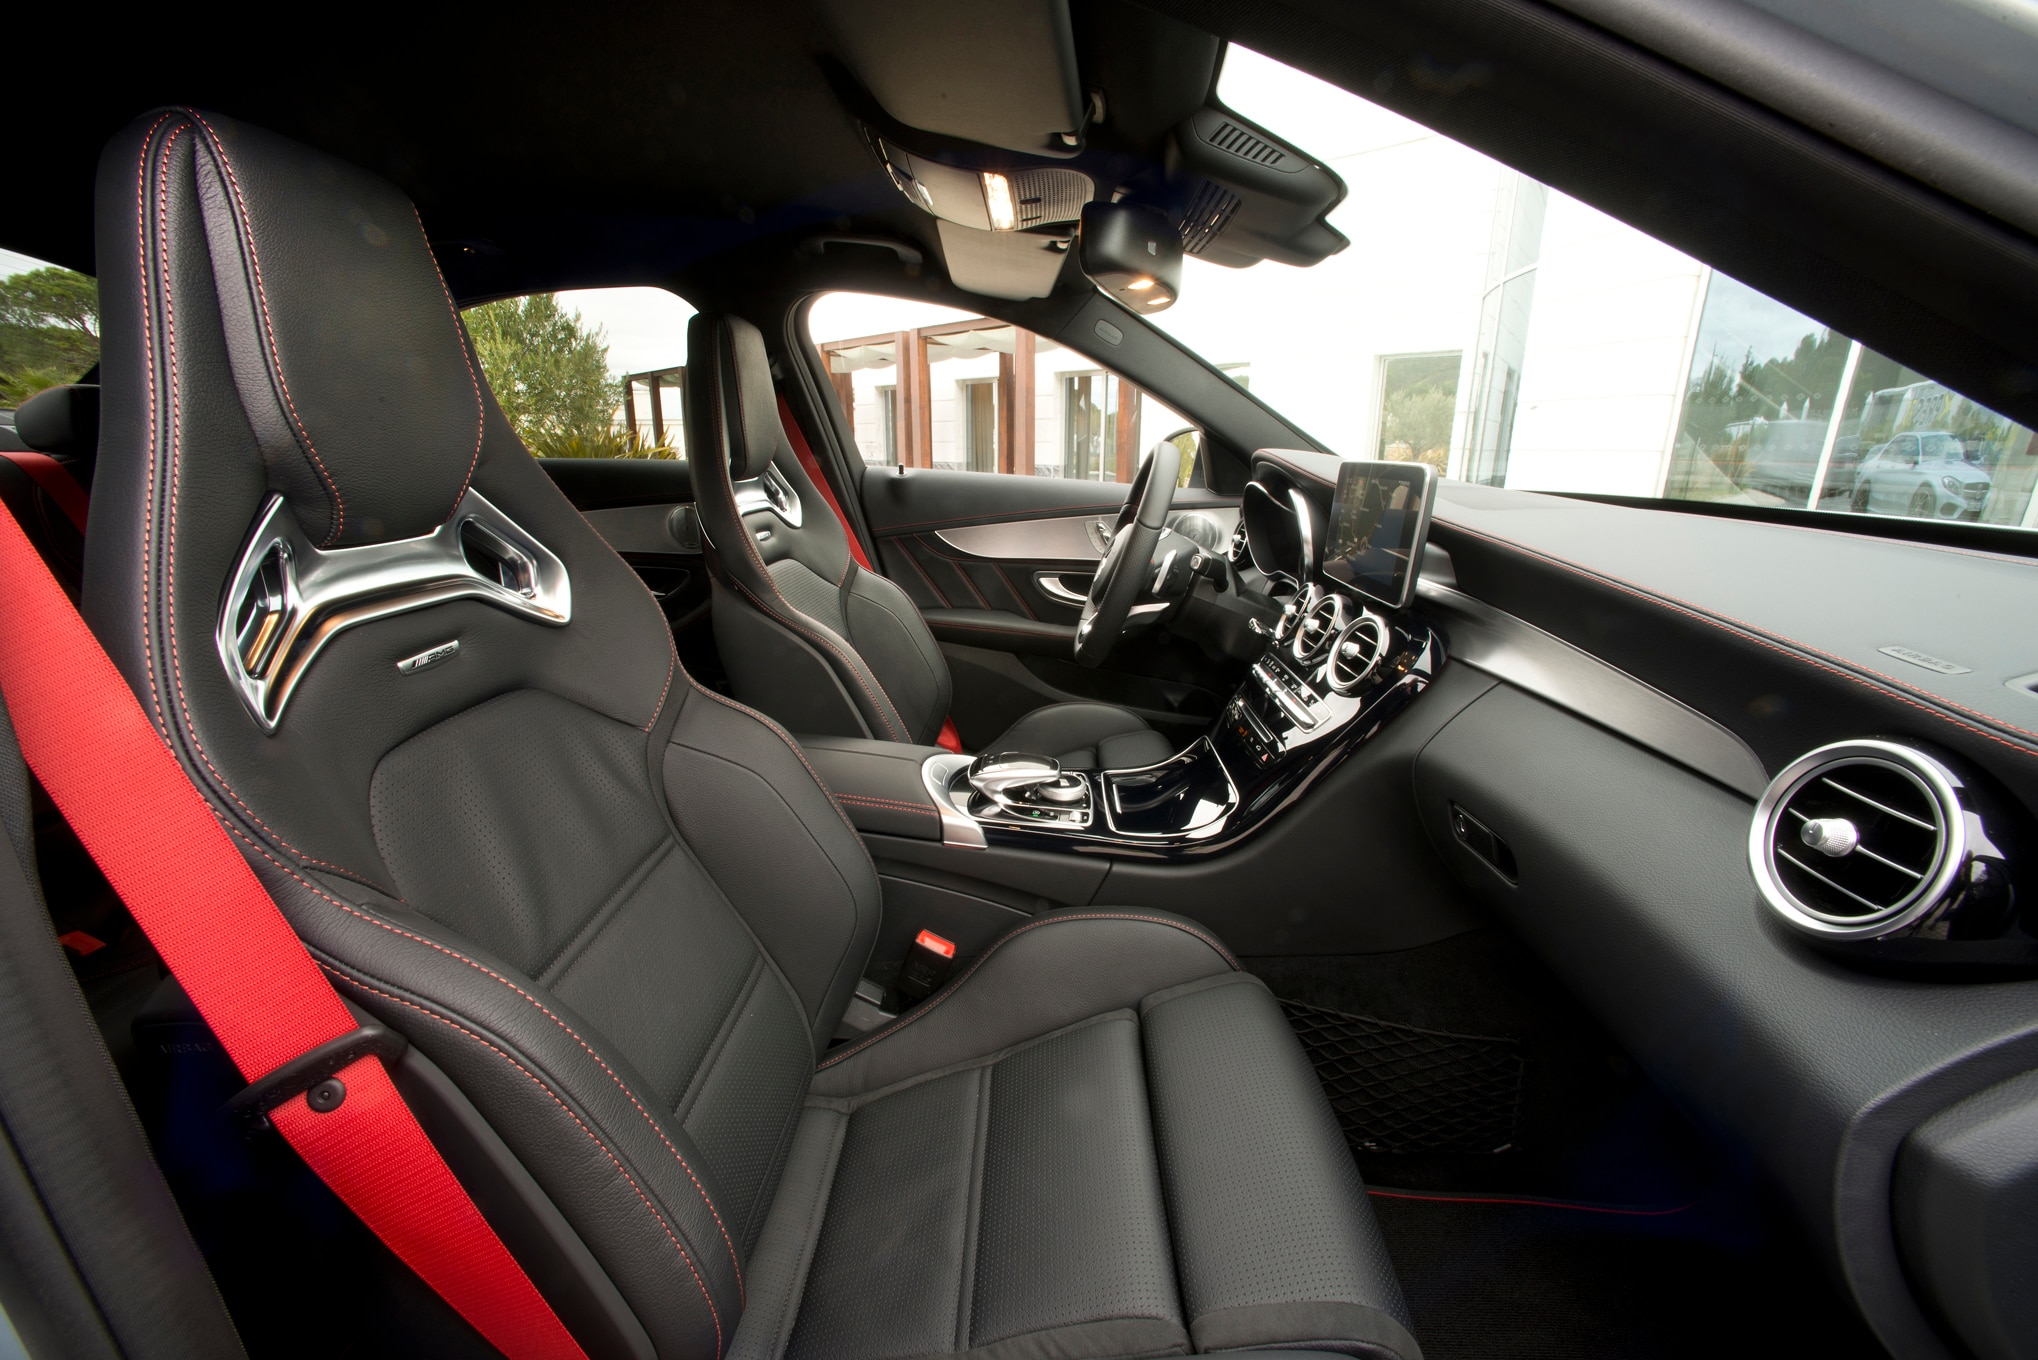 http://st.automobilemag.com/uploads/sites/11/2015/02/2016-Mercedes-Benz-C450-AMG-4Matic-front-interior-seats.jpg